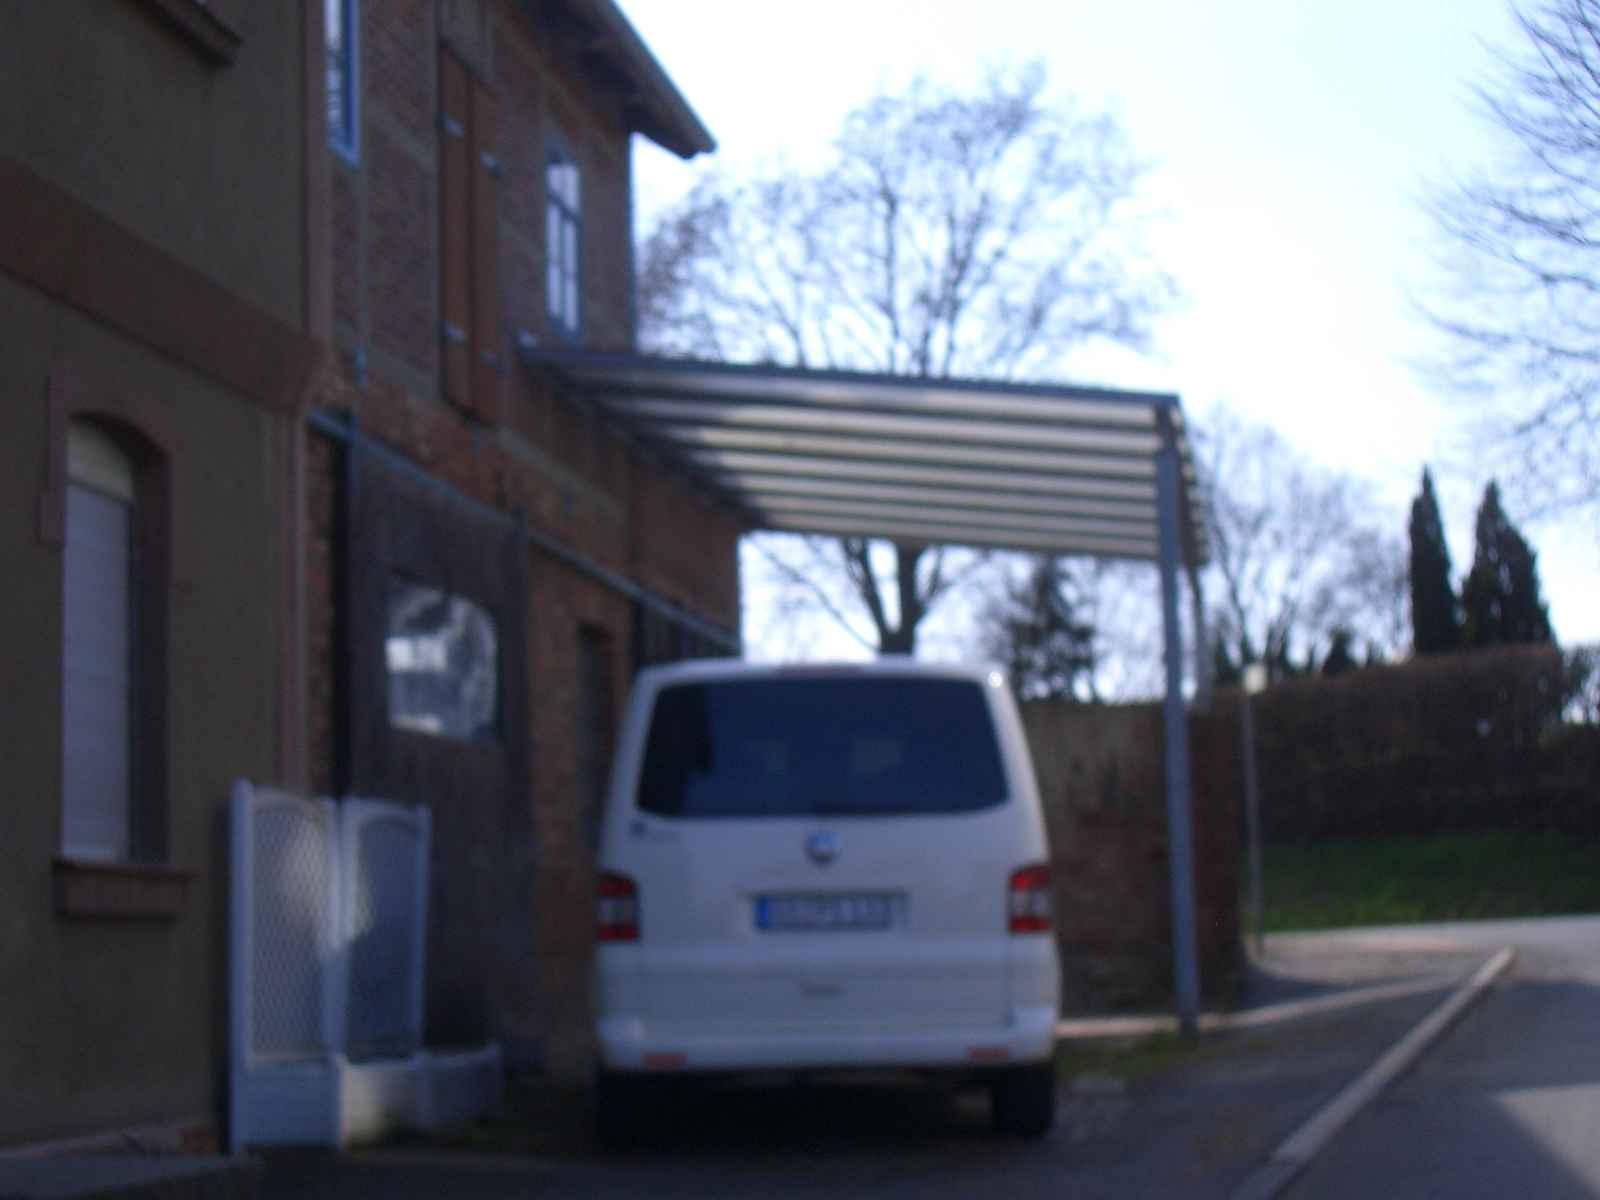 Hirsch Metallbau Spezial 005 - Spezial-05